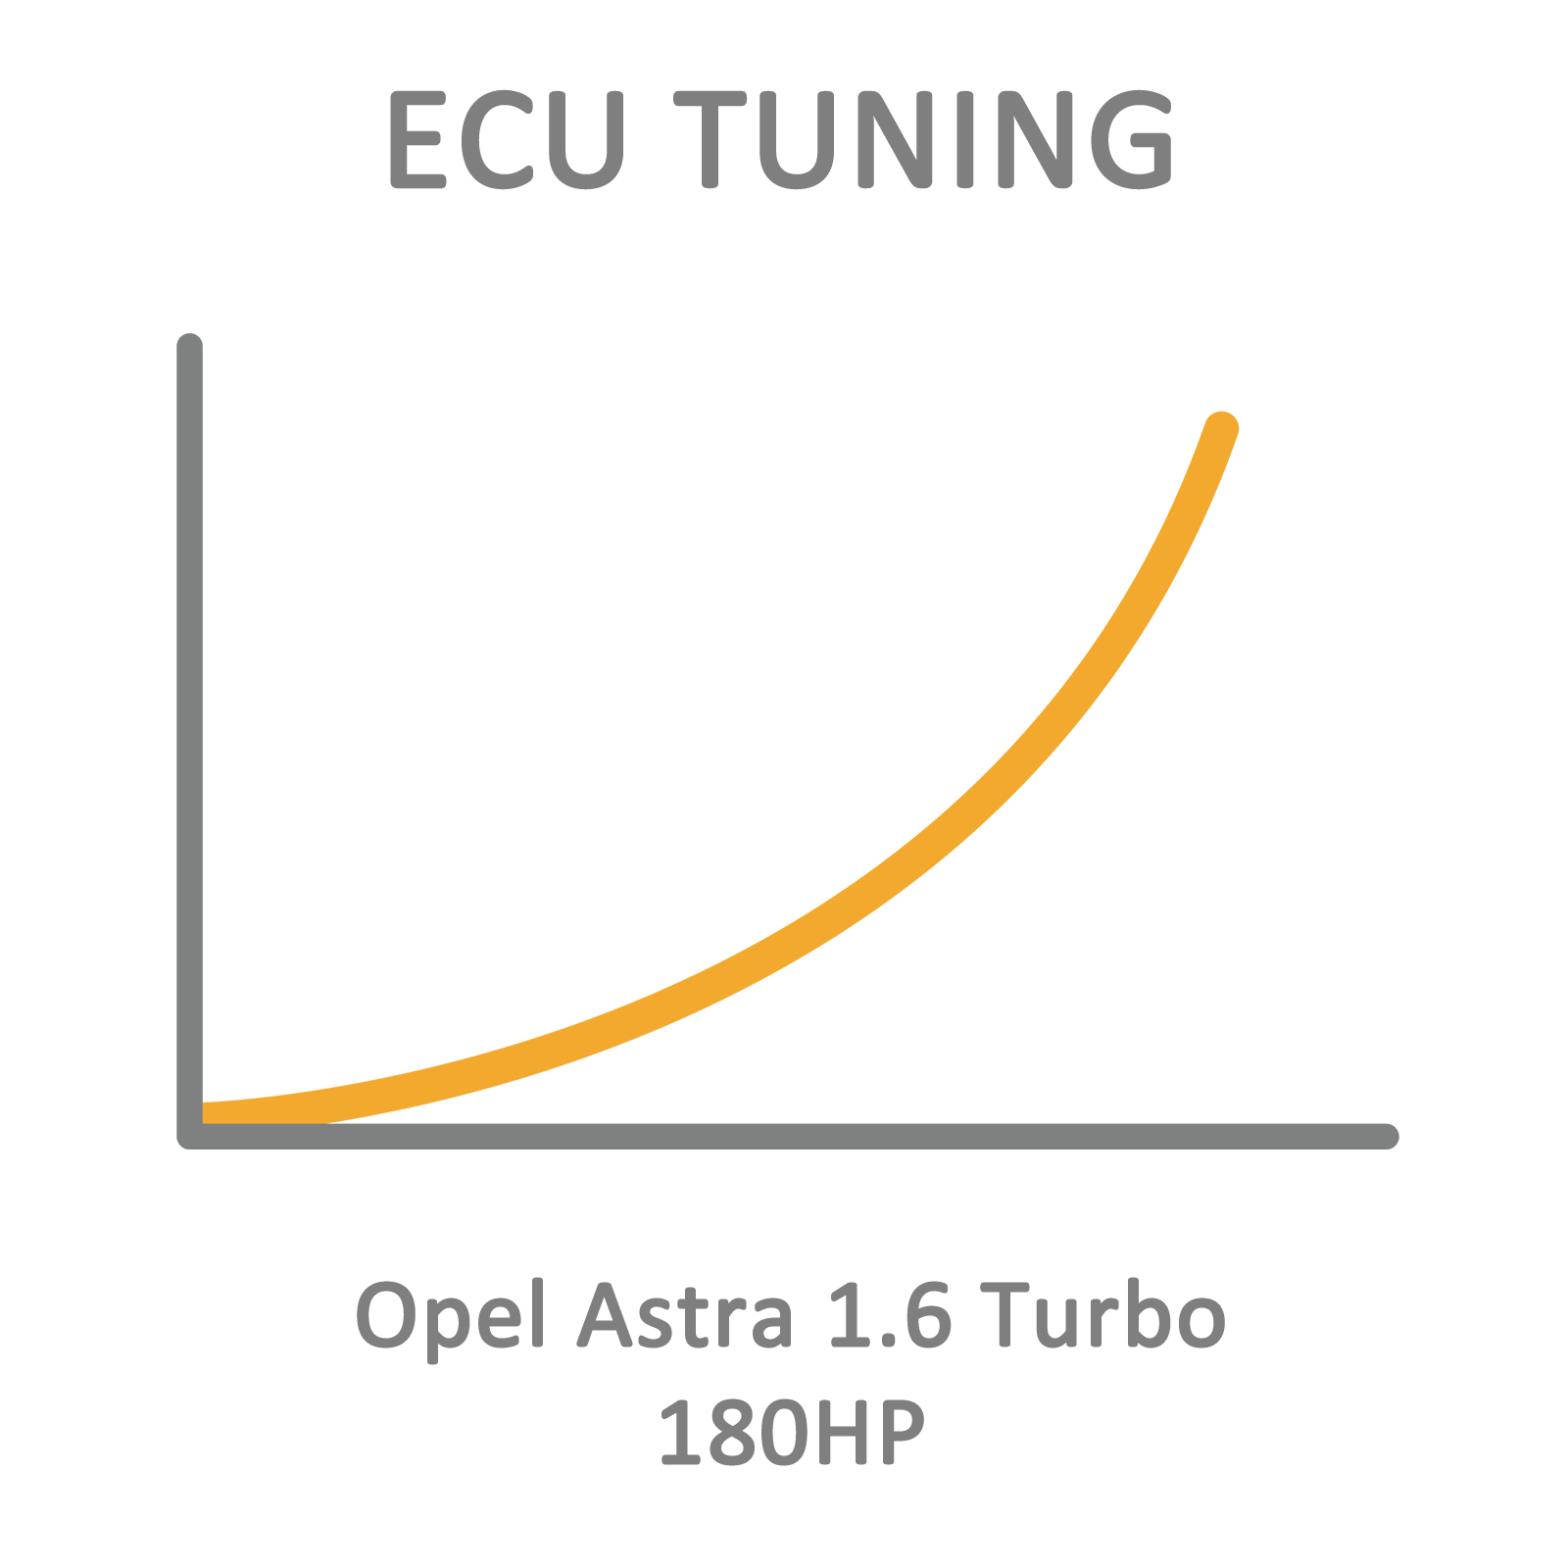 Opel Astra 1.6 Turbo 180HP ECU Tuning Remapping Programming